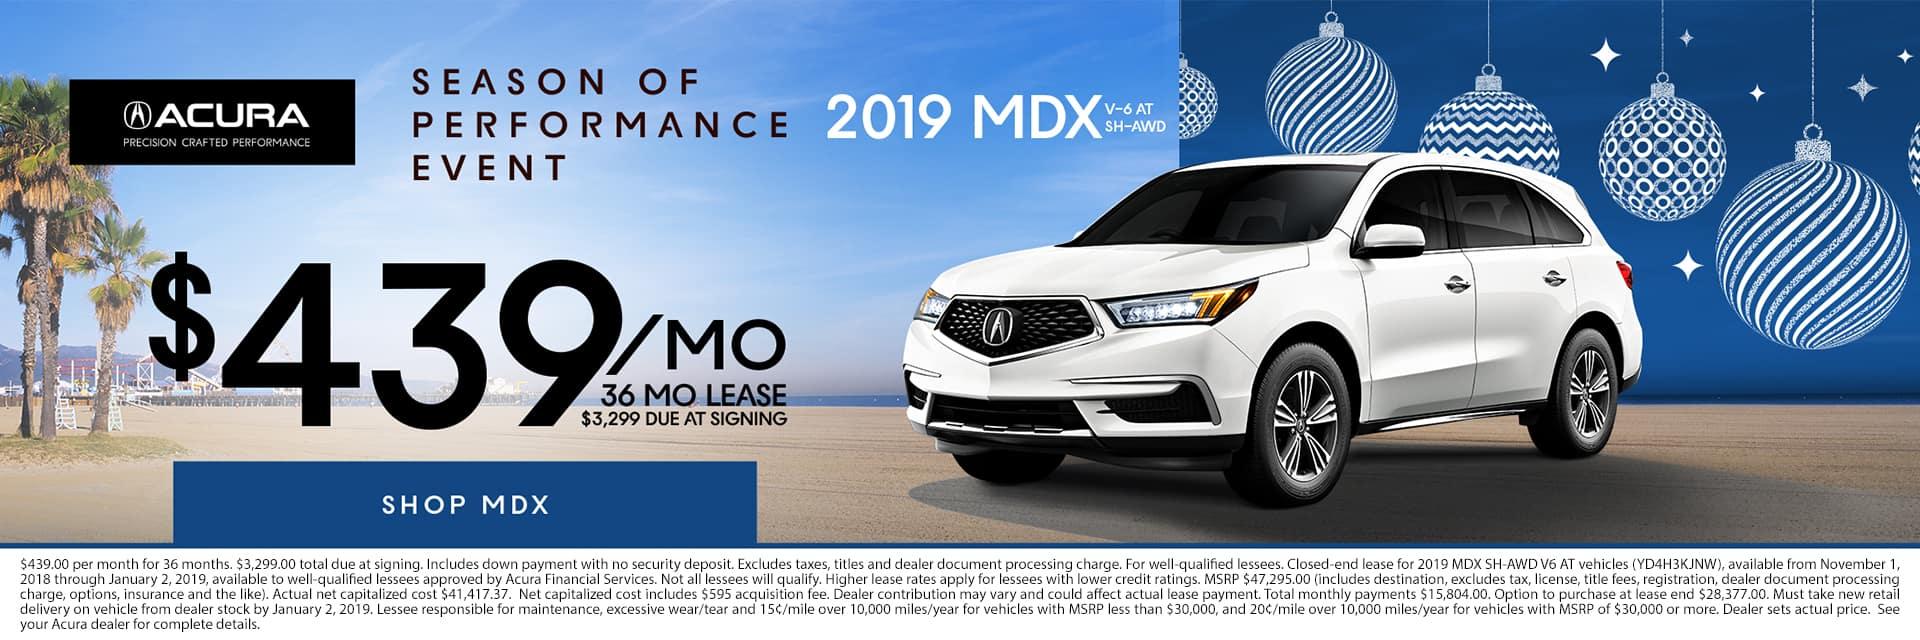 2019 MDX Season of Performance